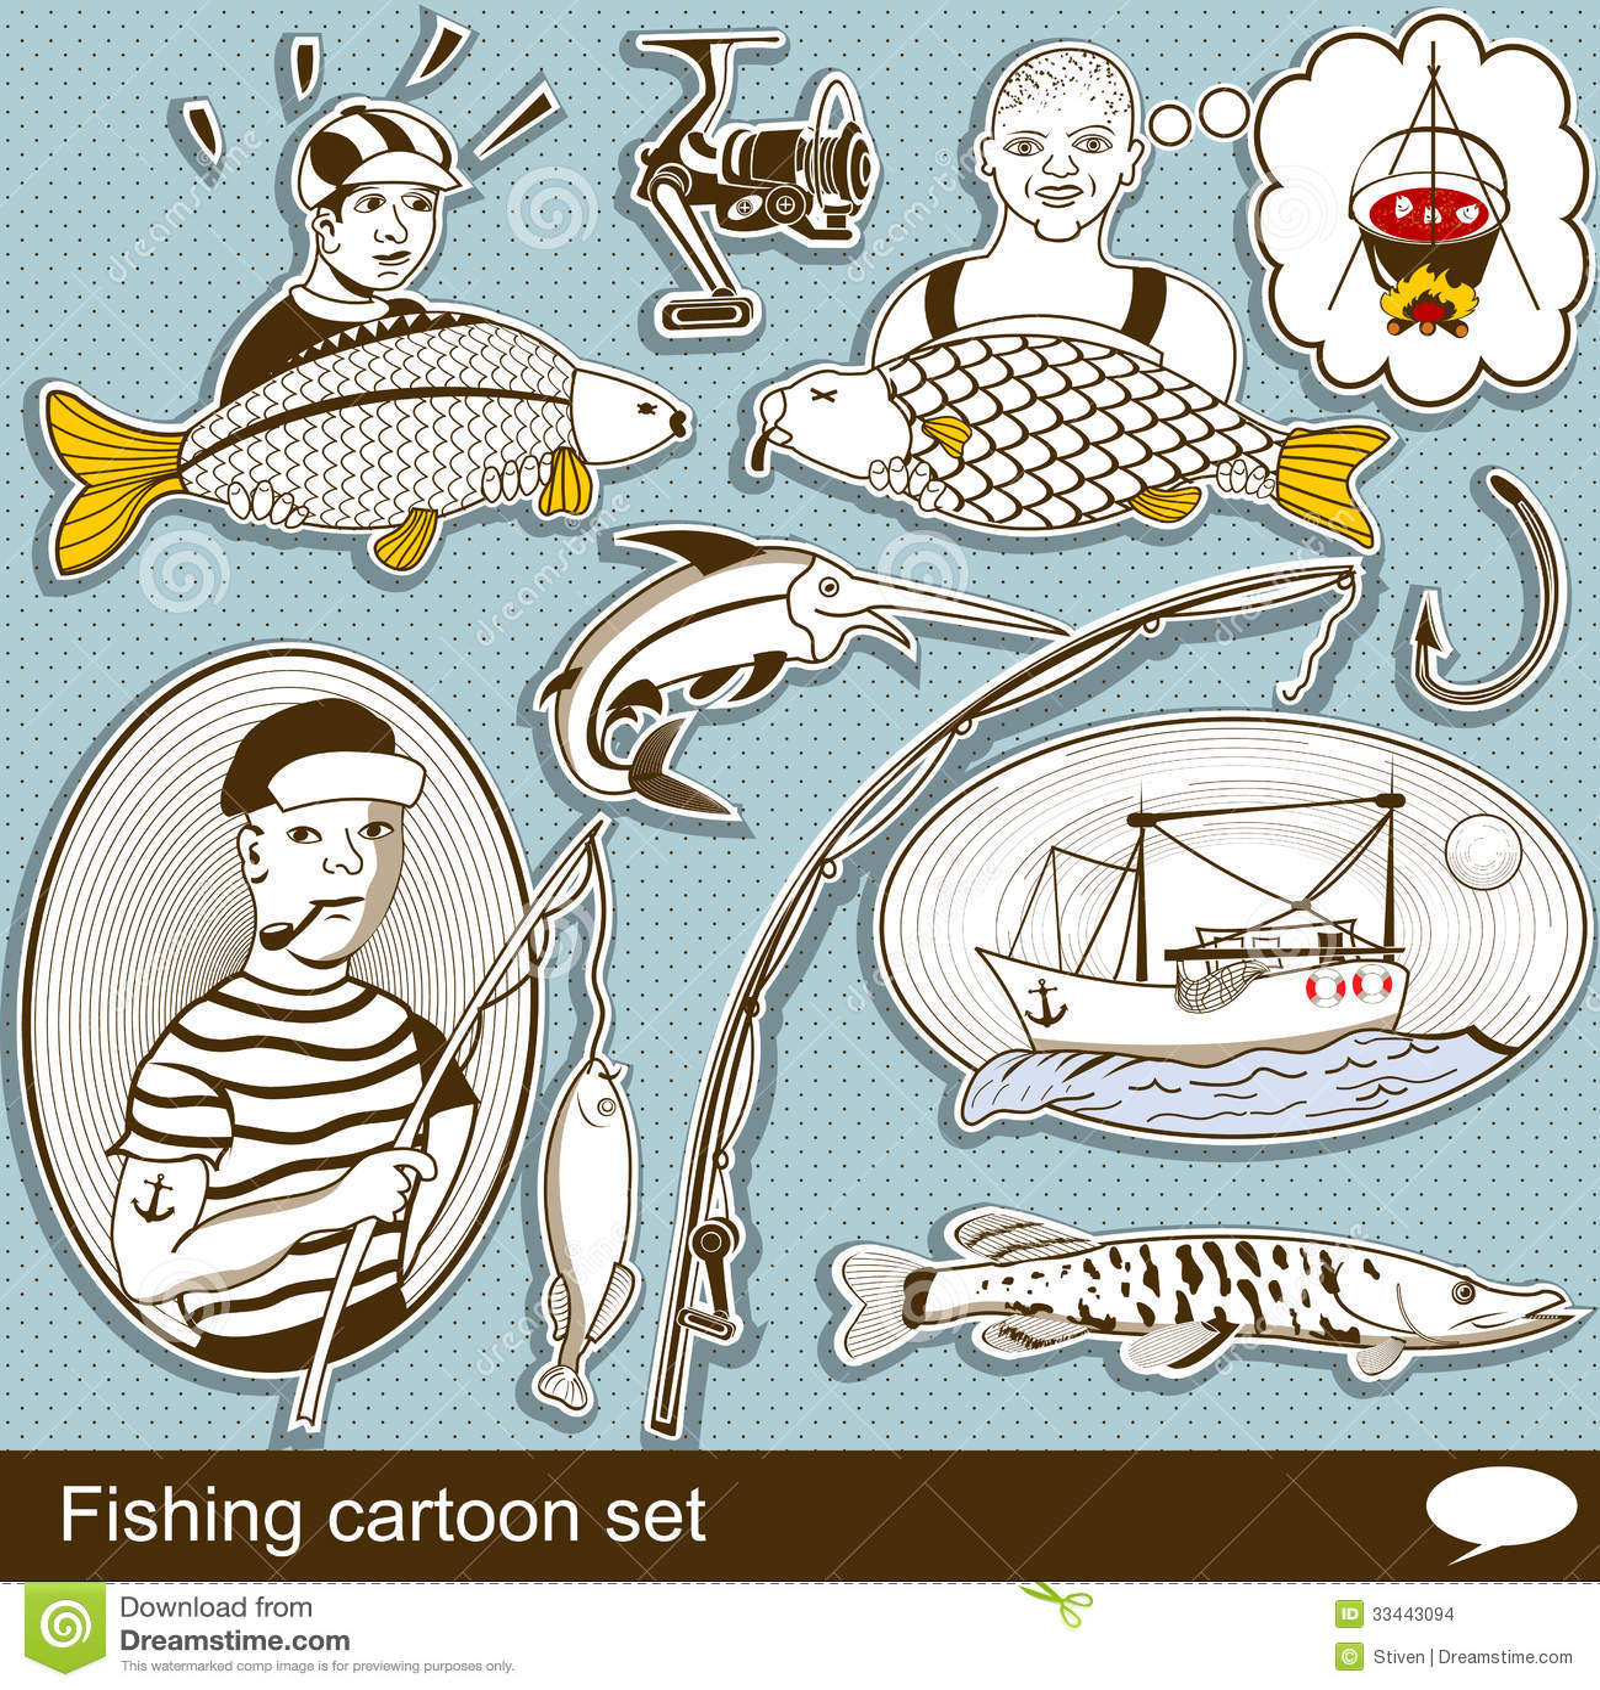 how to draw a cartoon fisherman